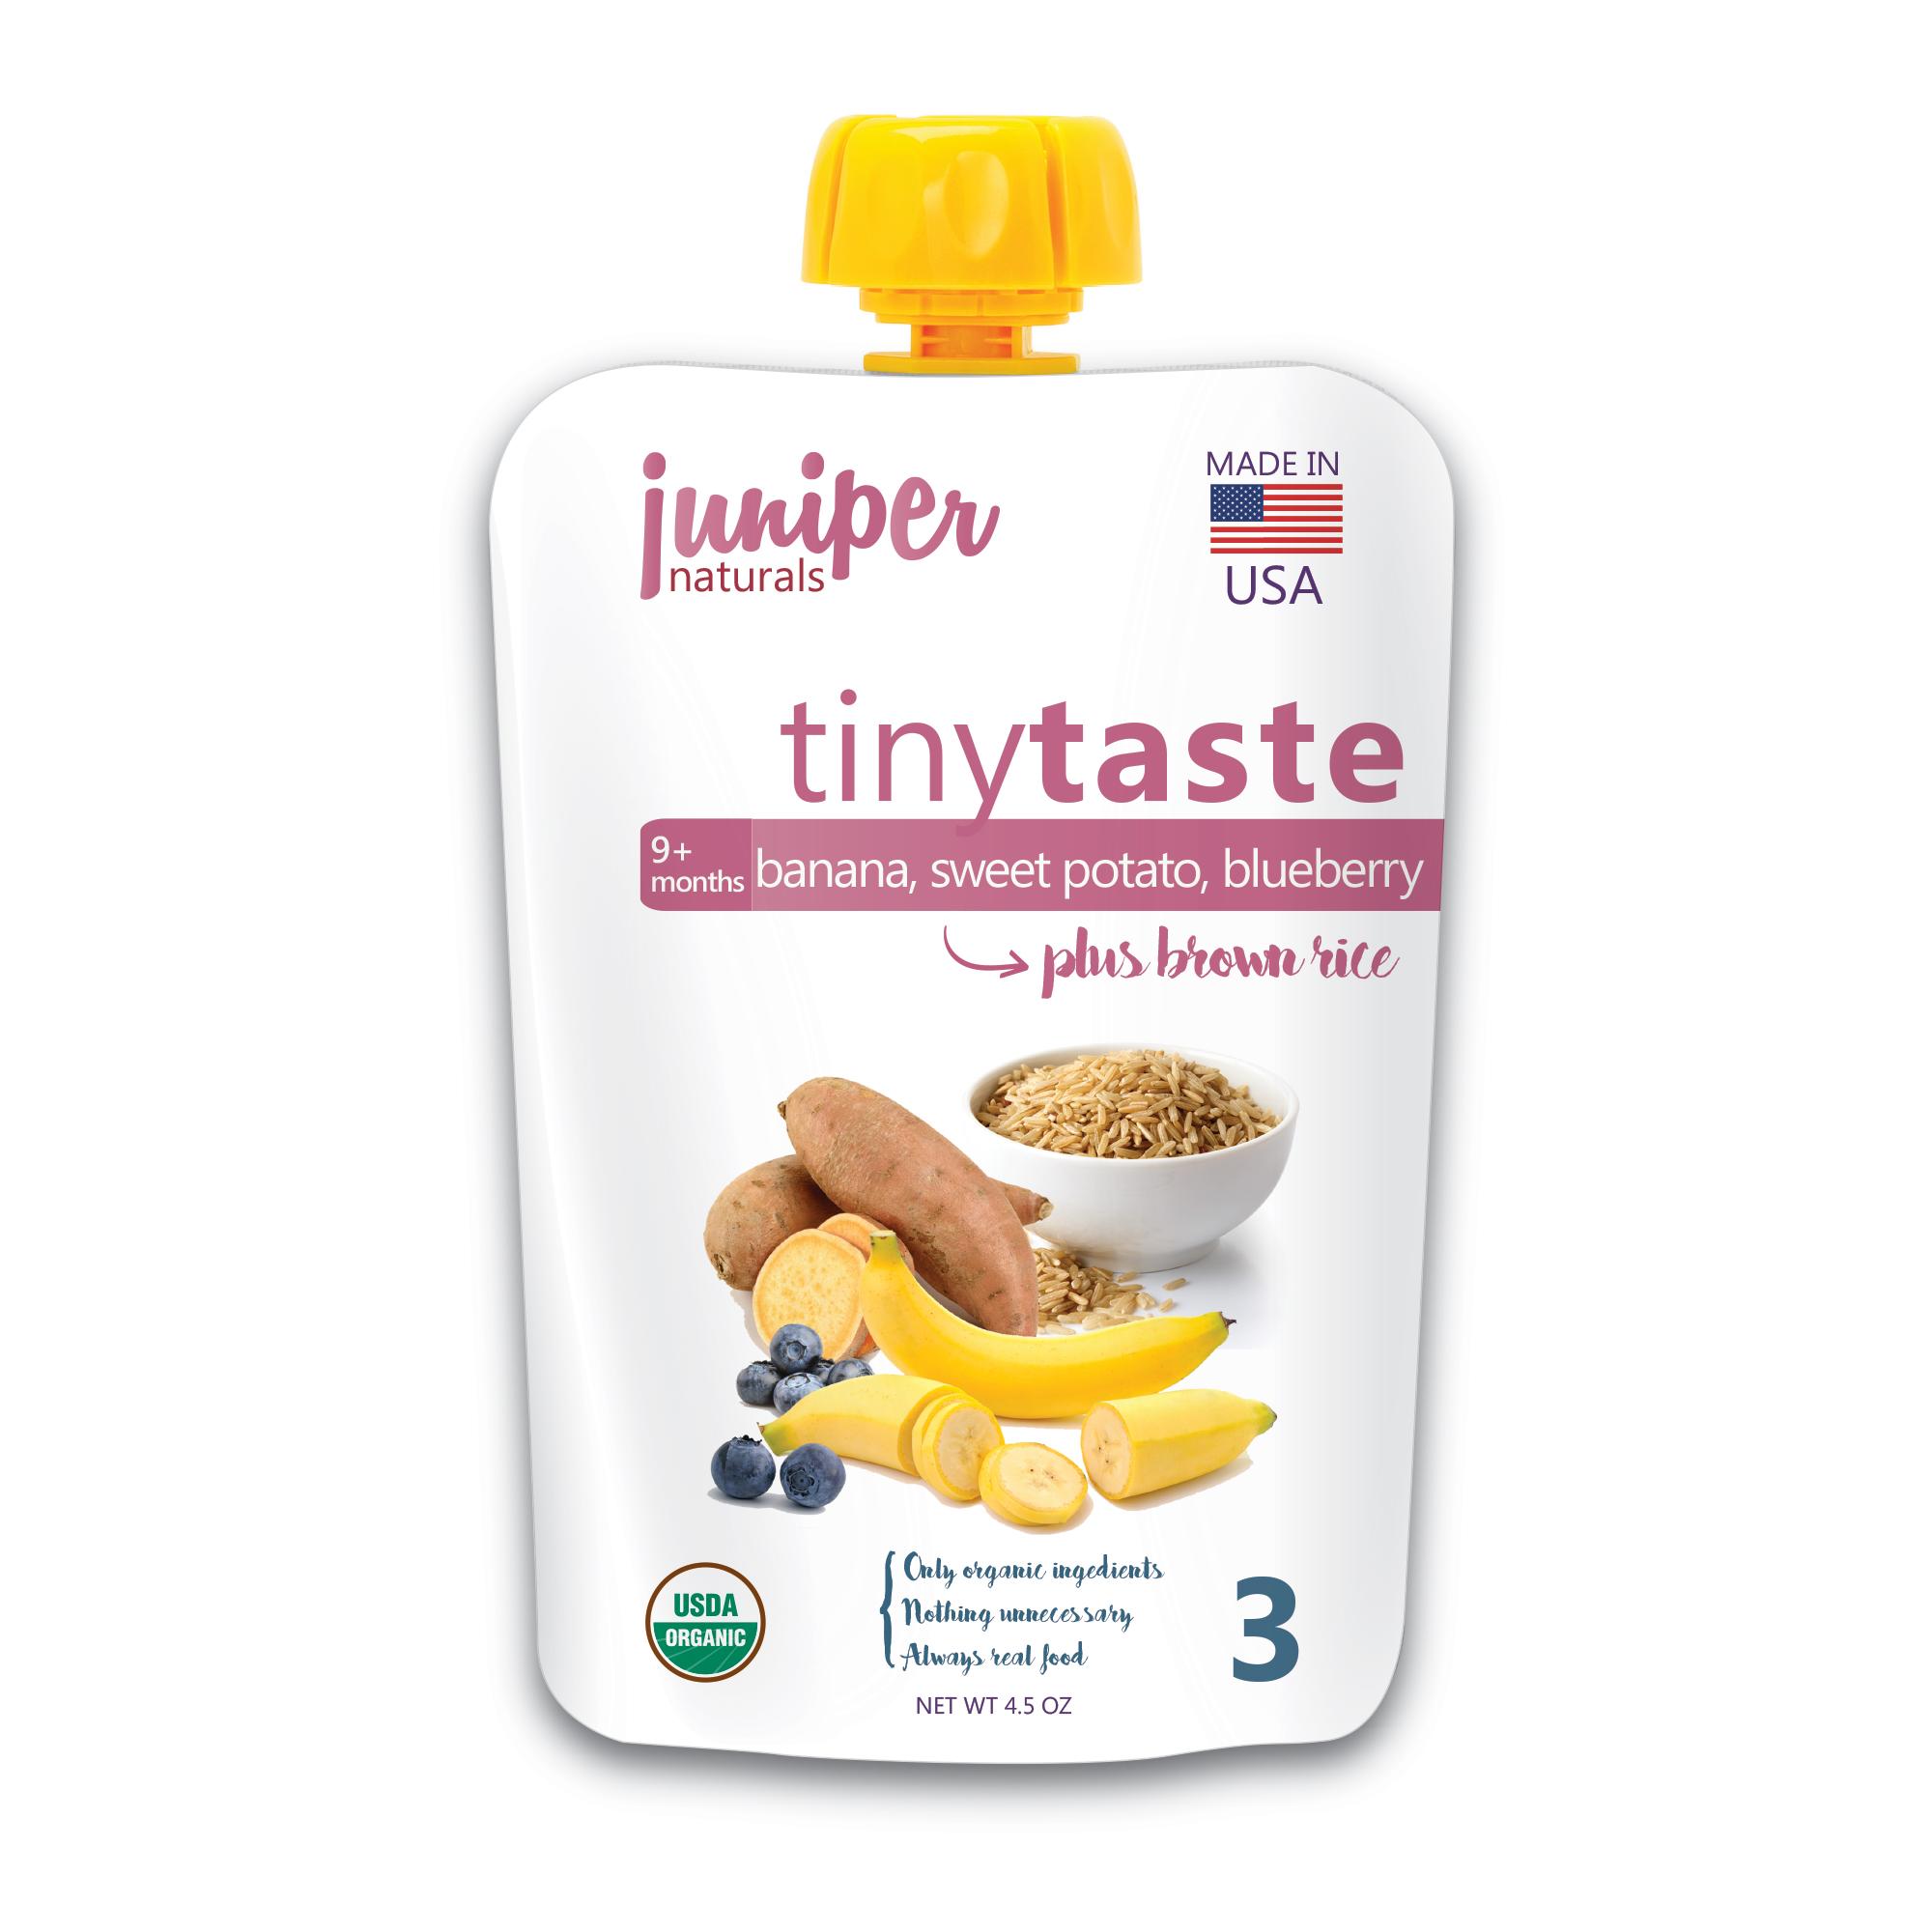 Juniper Naturals banana, sweet potato, blueberry and brown rice puree